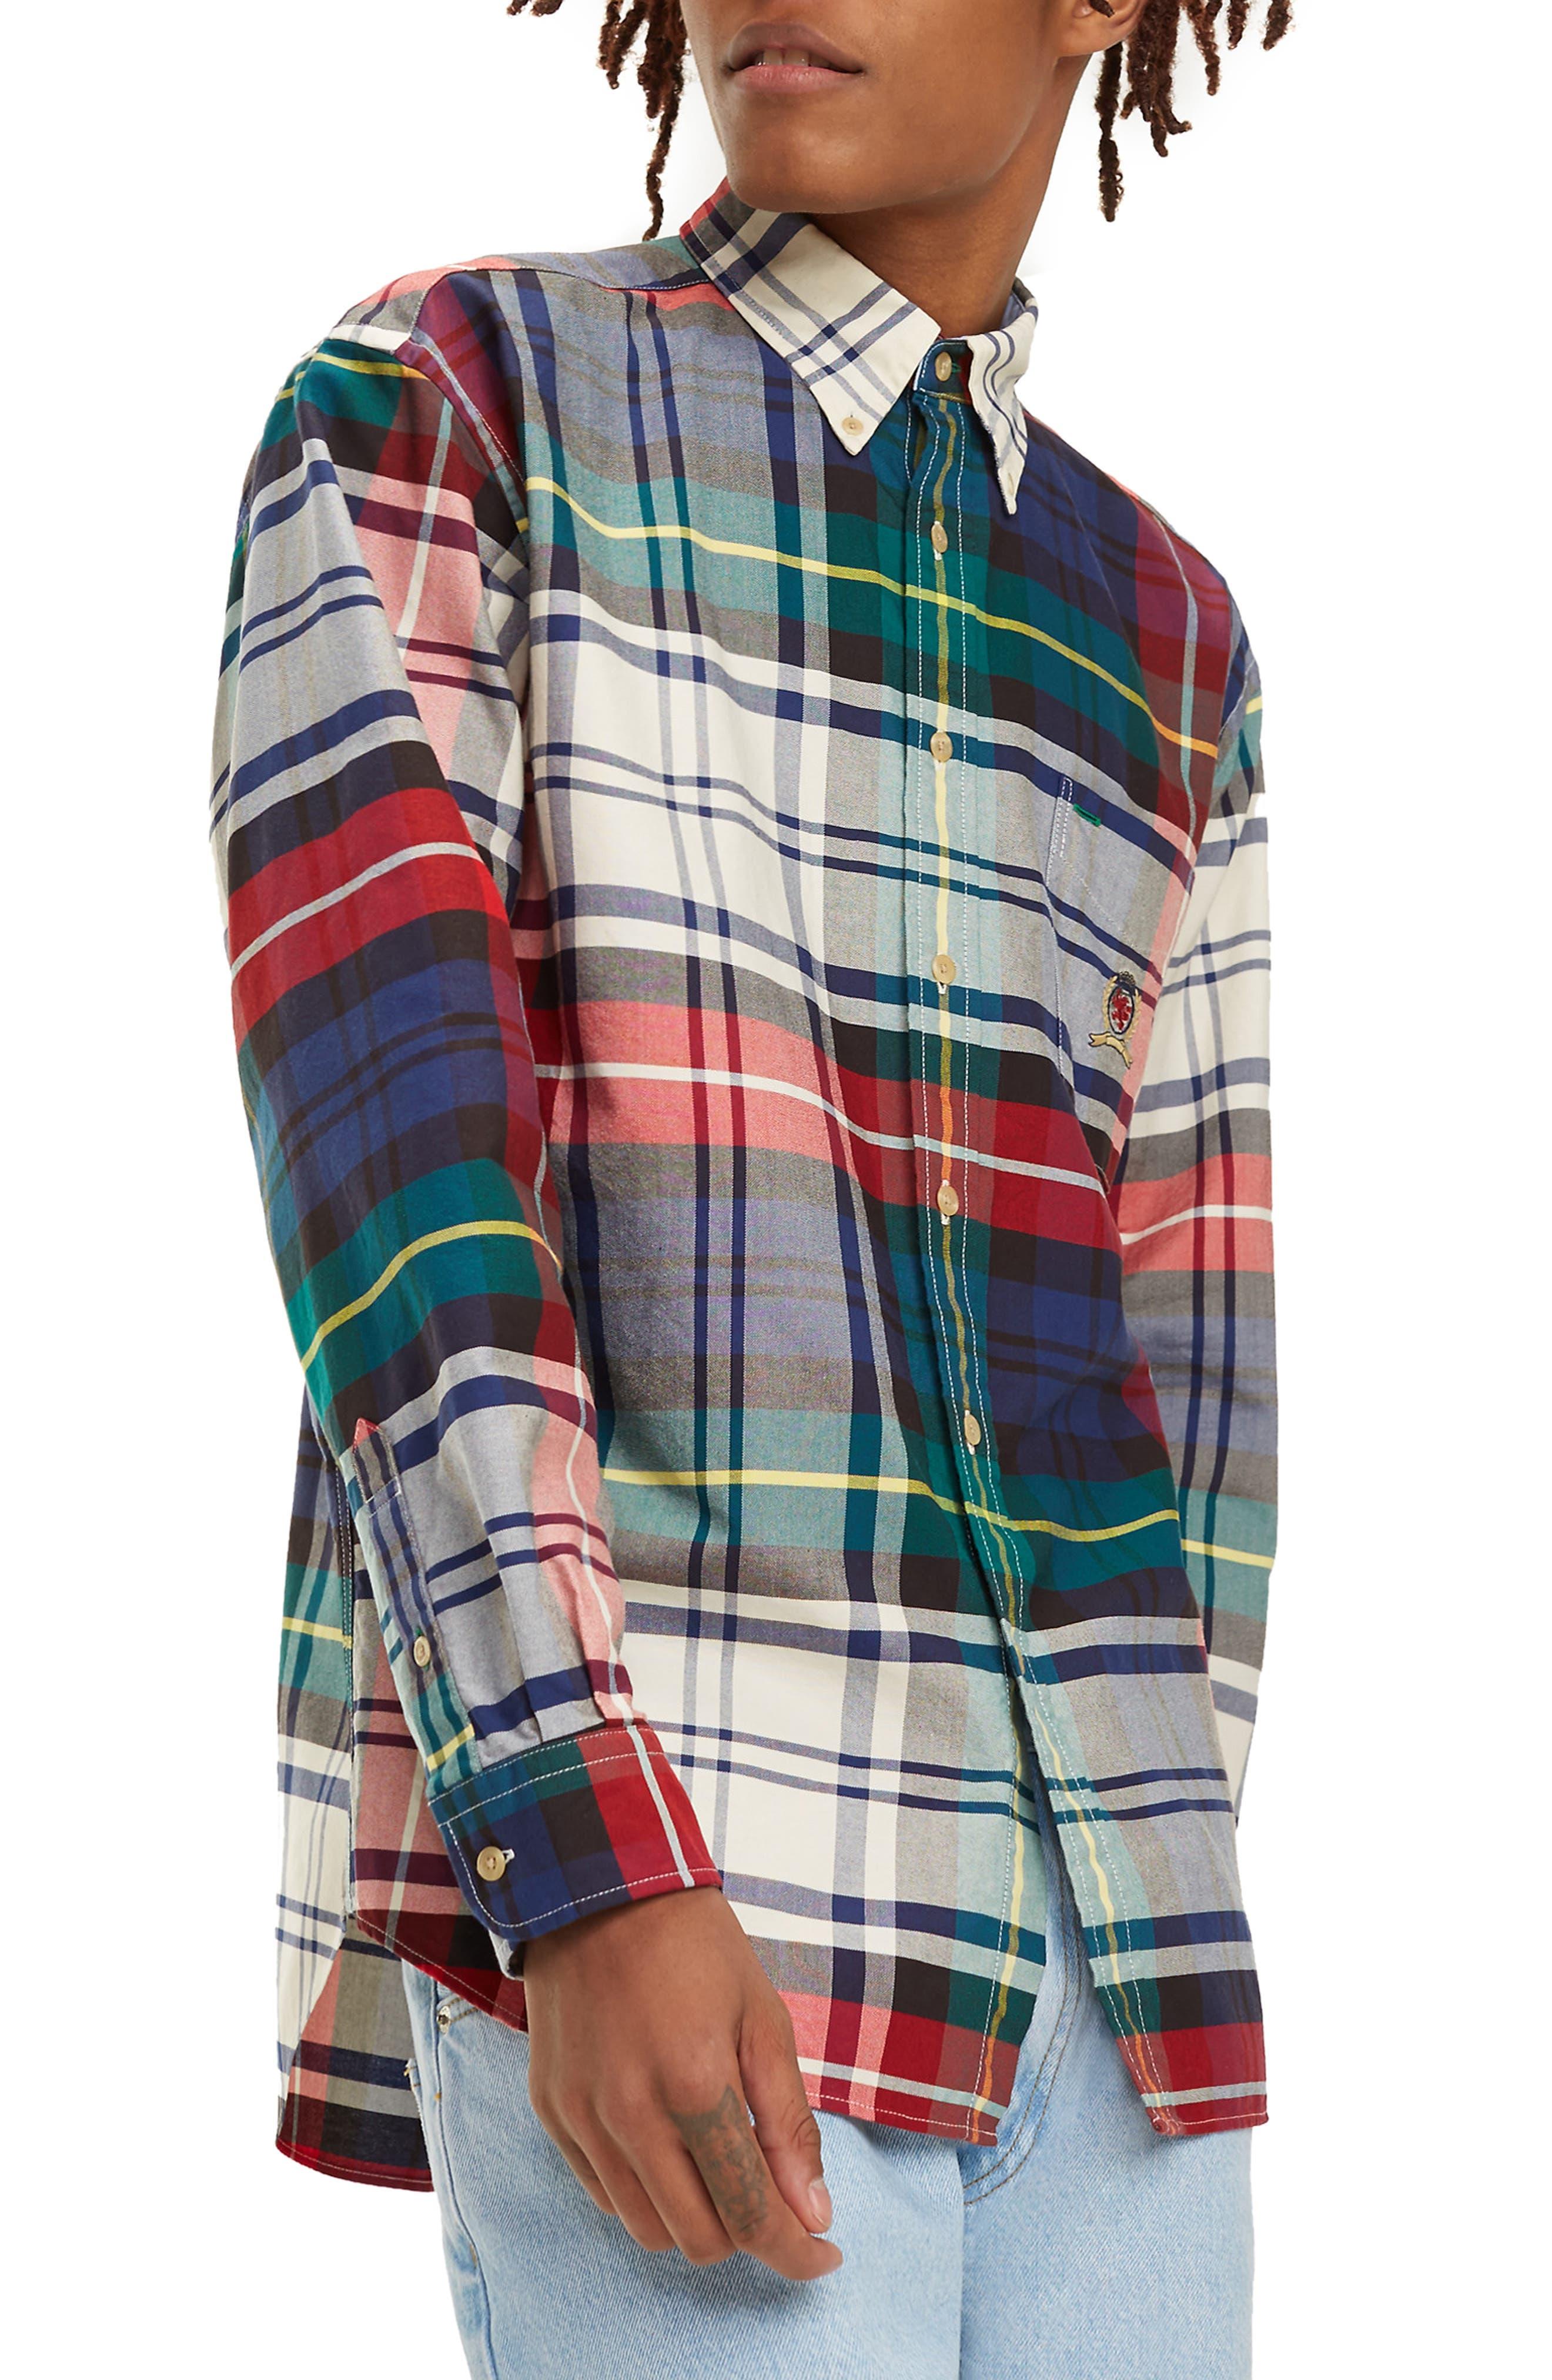 TJM Plaid Crest Sport Shirt,                             Main thumbnail 1, color,                             CHECK DARK SAPPHIRE / MULTI